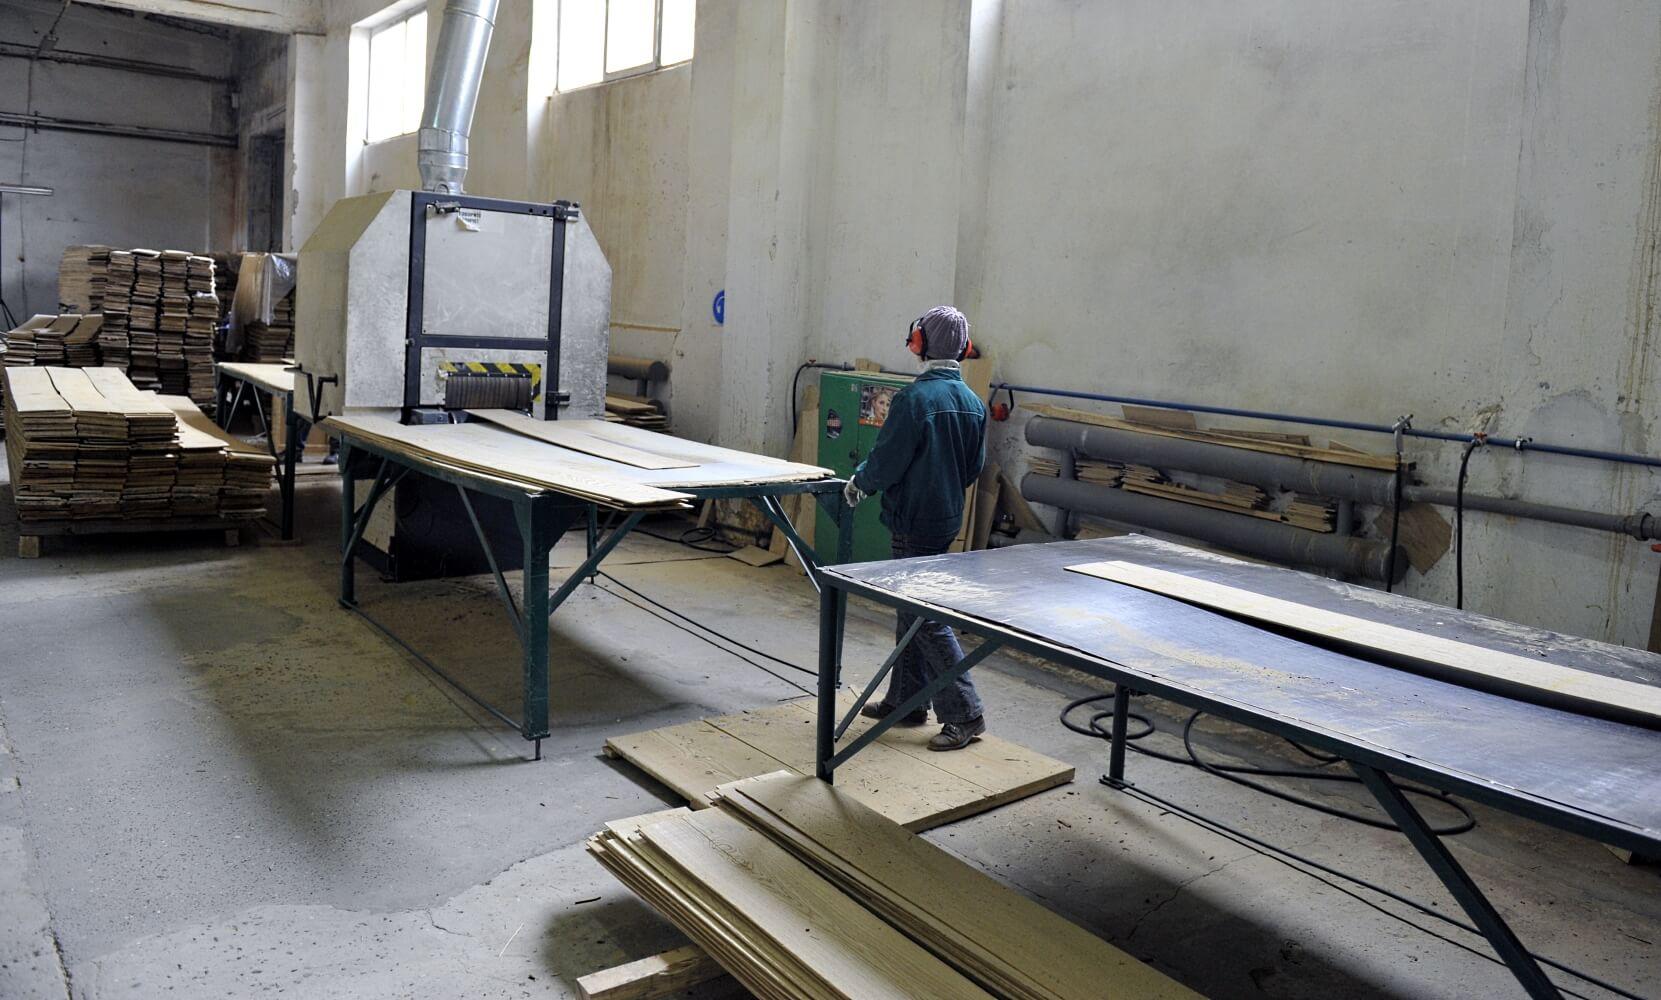 LLC IE Ukrlisexport, we produce and export lamellas (sawn veneer) from oak, beech, ash